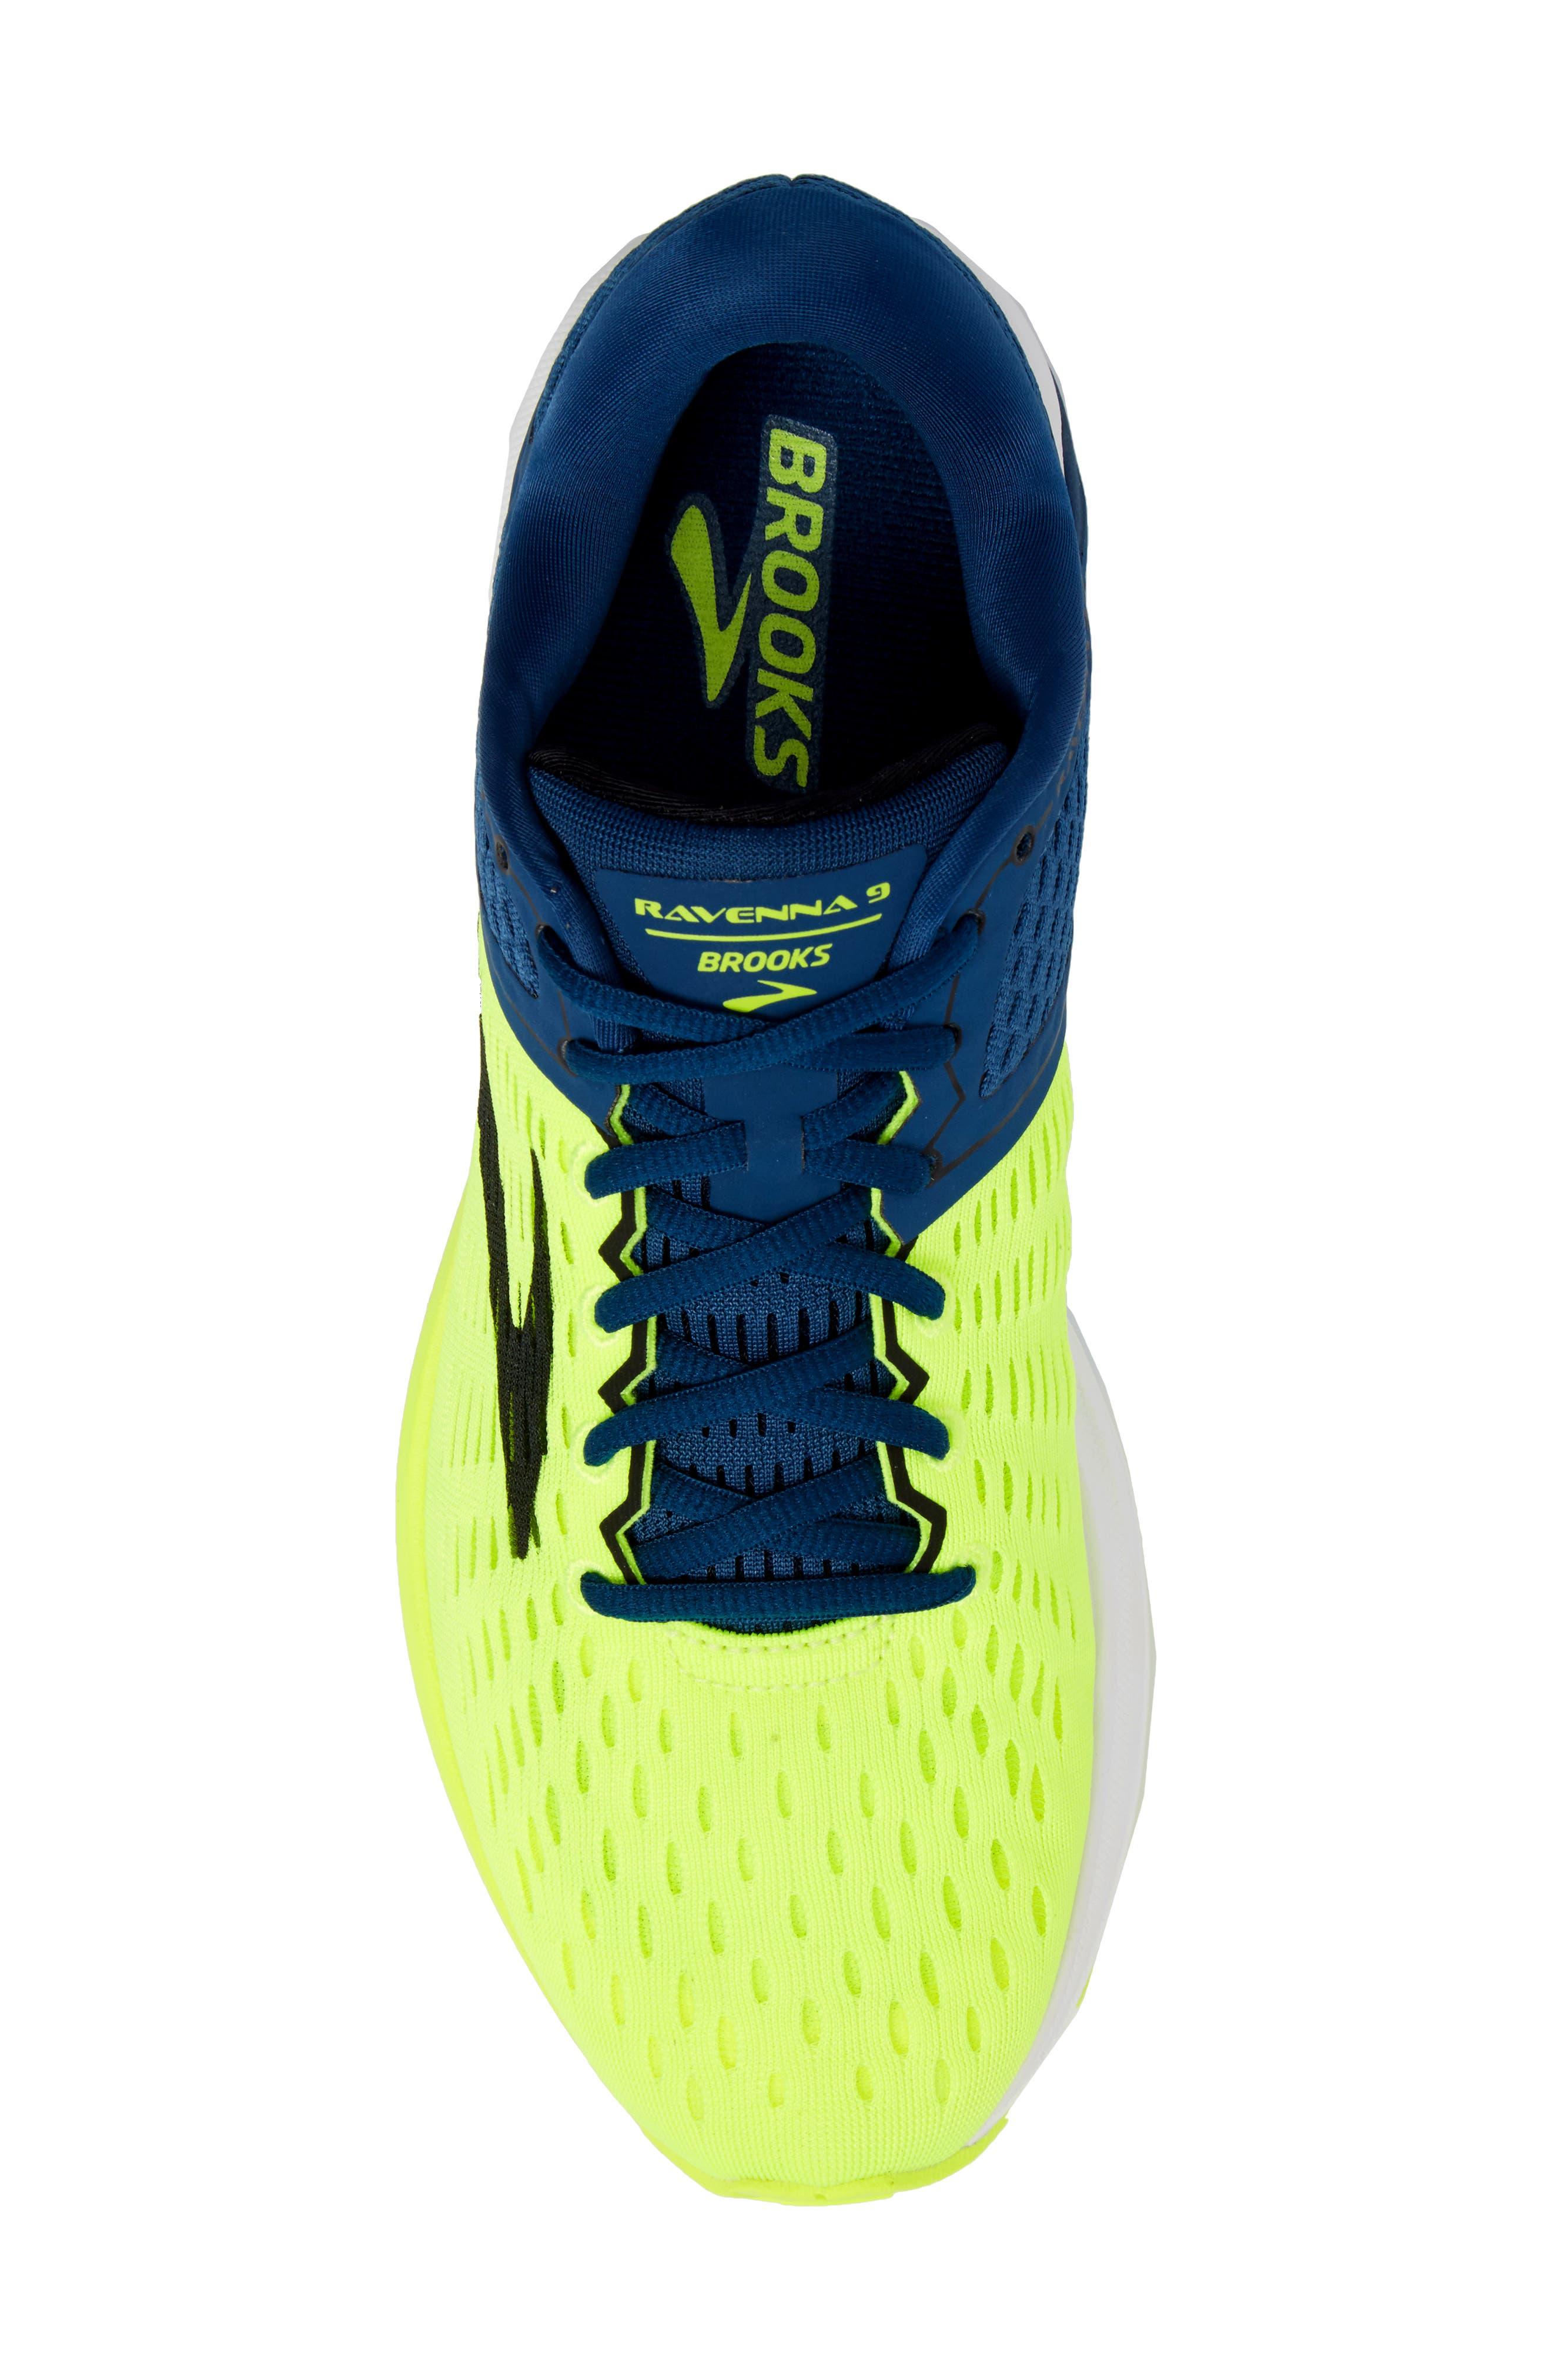 Ravenna 9 Running Shoe,                             Alternate thumbnail 5, color,                             Nightlife/ Blue/ Black